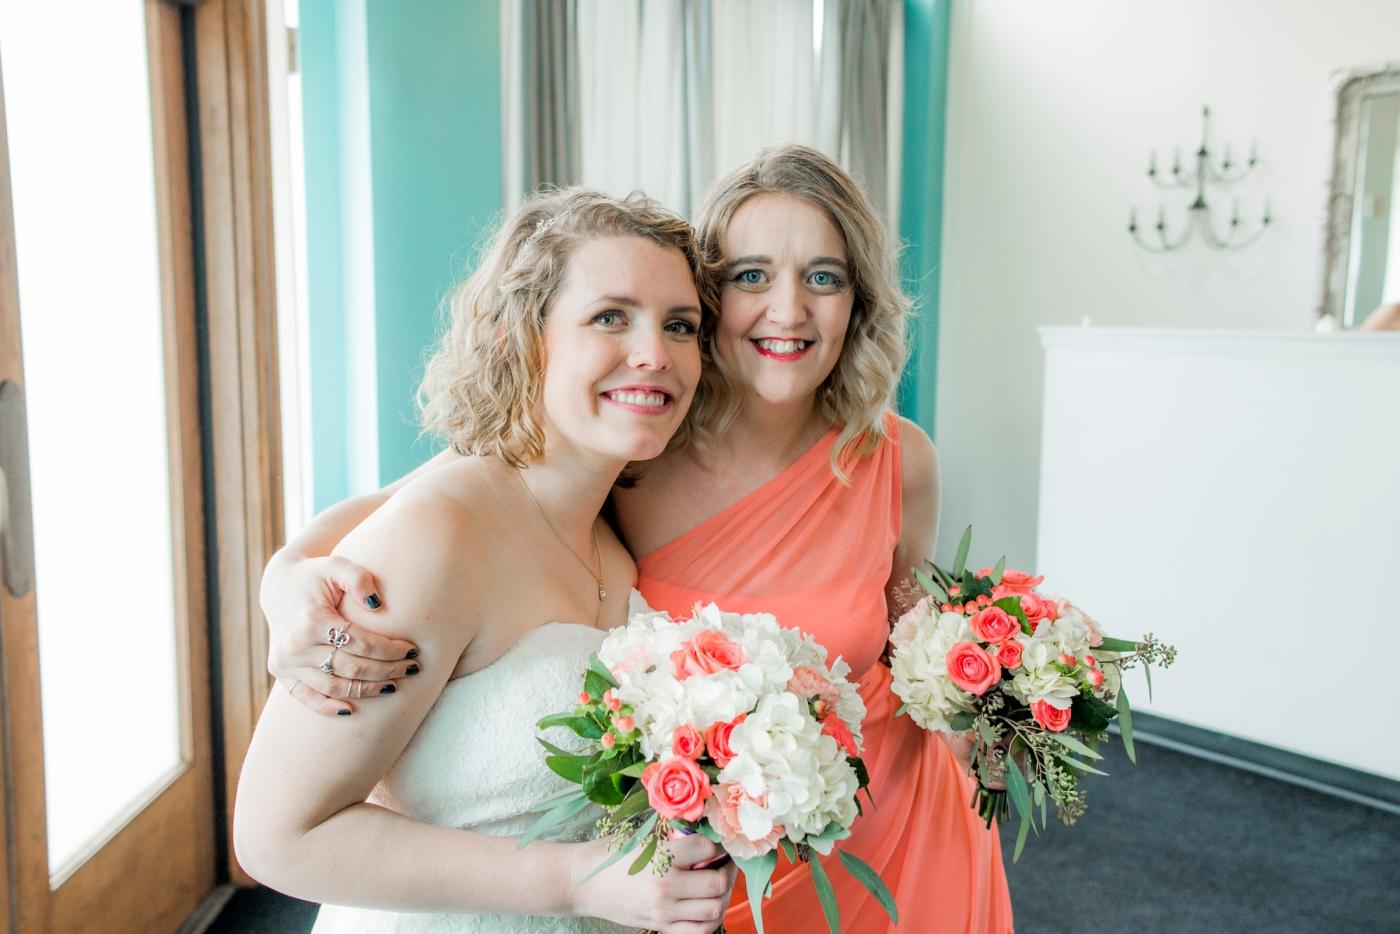 DSC_2849Everett_Wedding_Ballroom_Jane_Speleers_photography_Rachel_and_Edmund_bridesmaids_2017